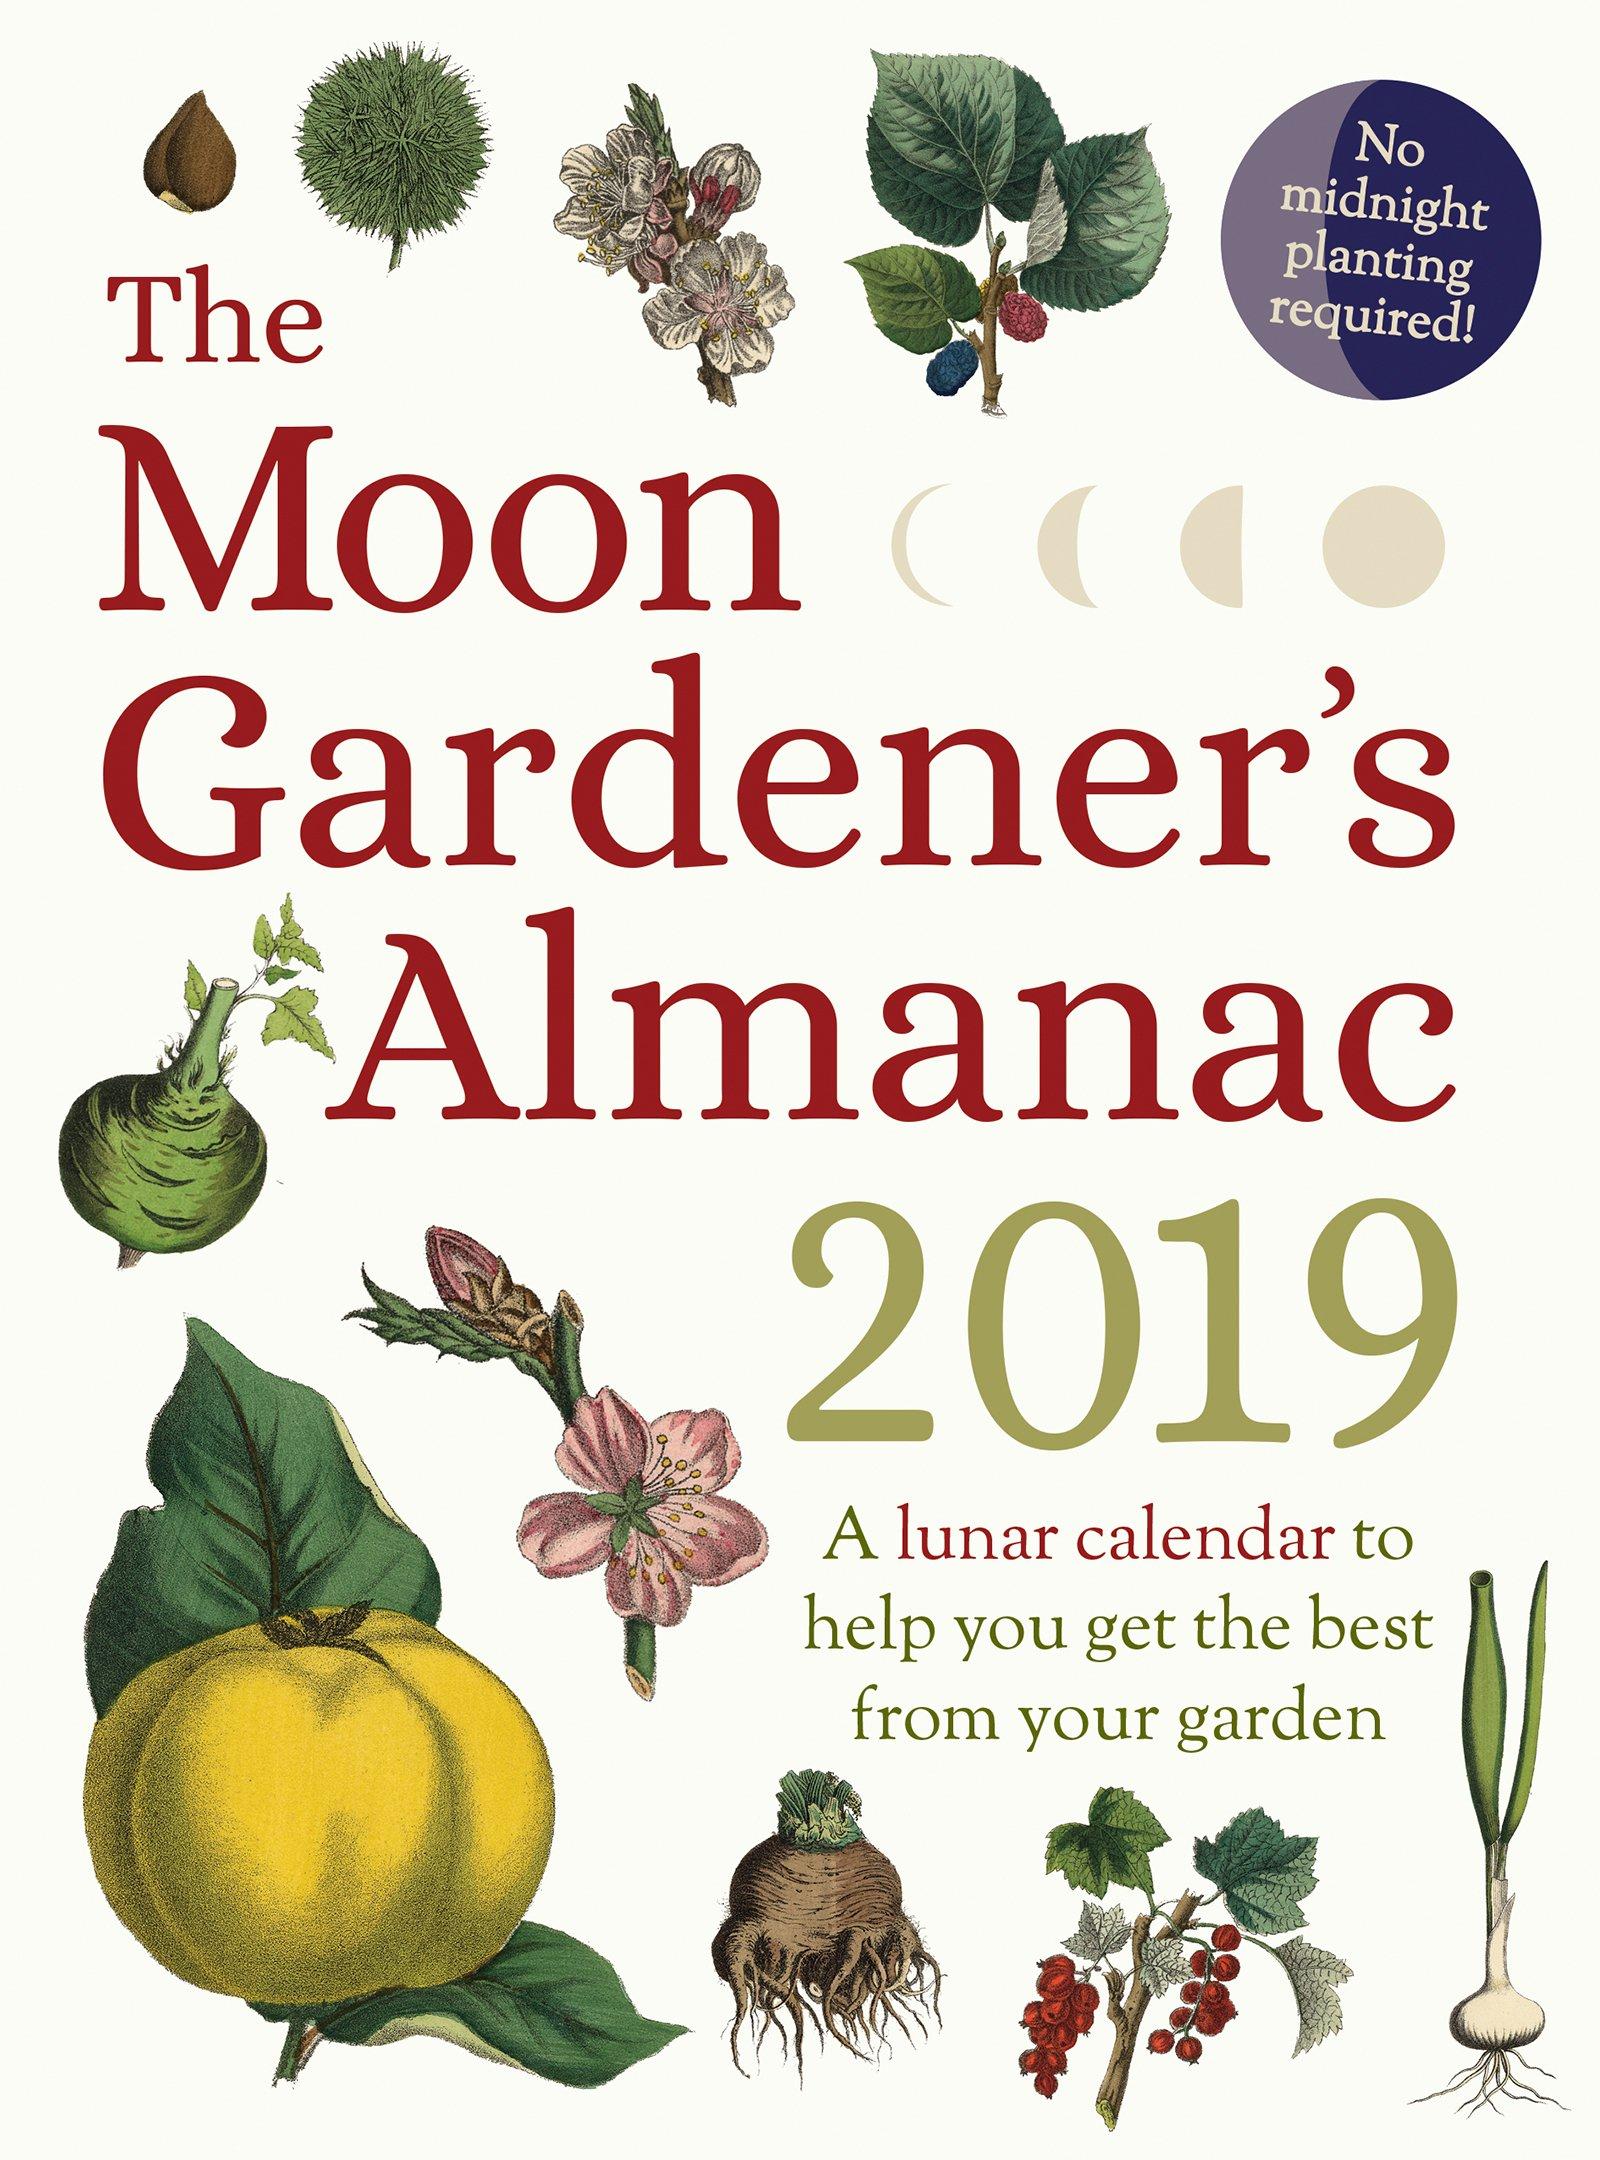 The Moon Gardener's Almanac: A Lunar Calendar to Help You Get the Best From Your Garden: 2019 by Floris Books